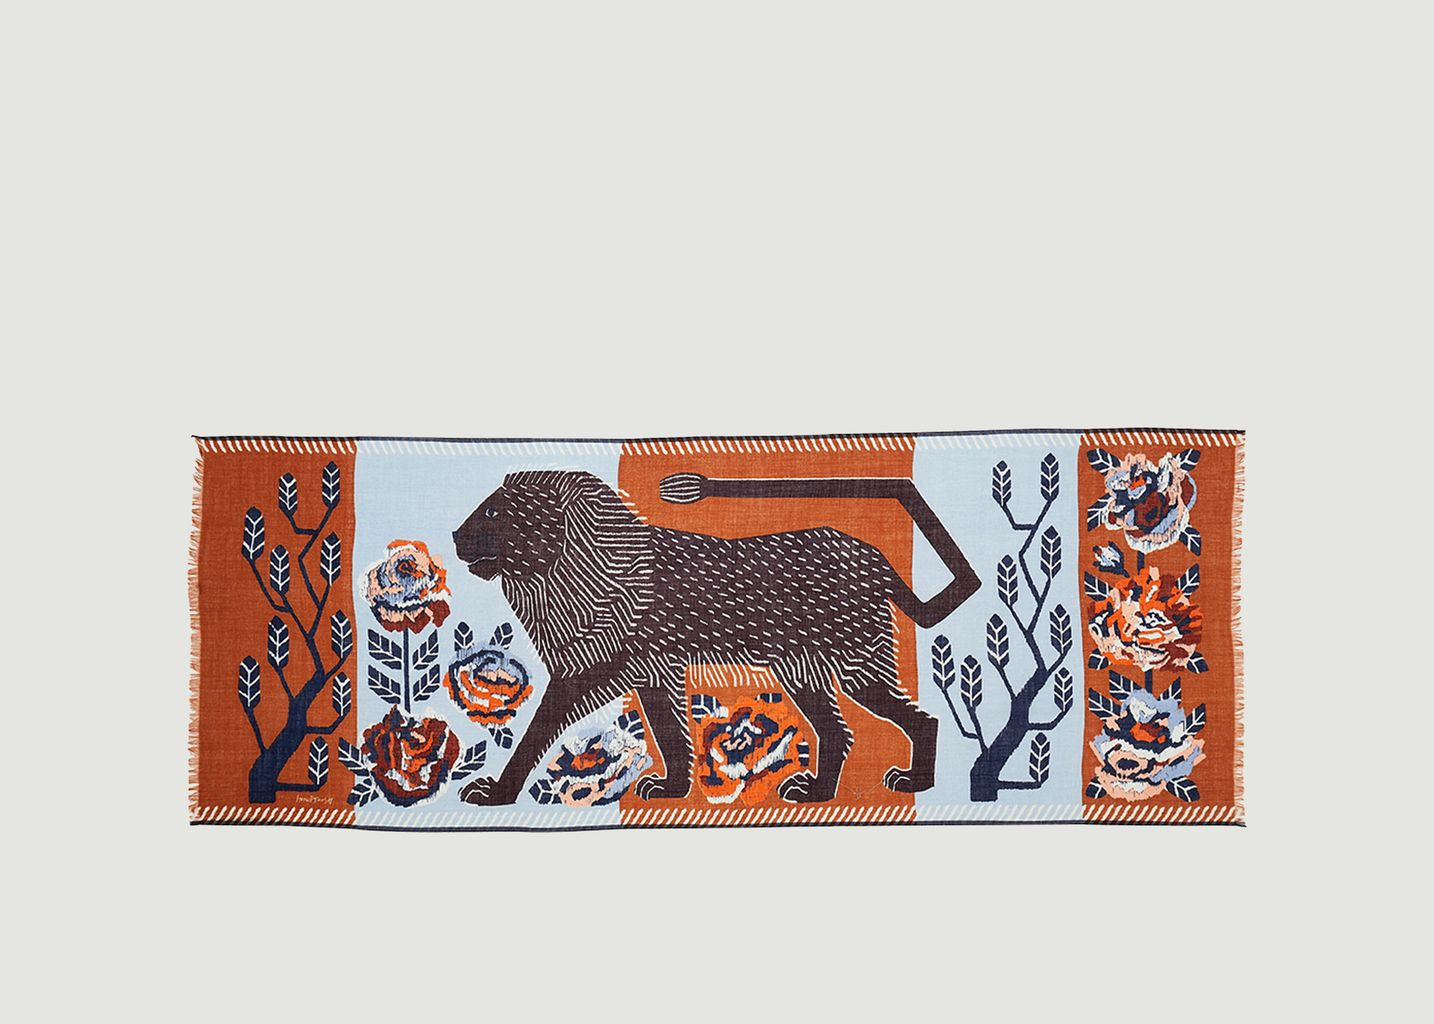 Etole motif lion et fleurs en laine Felide - Inouitoosh